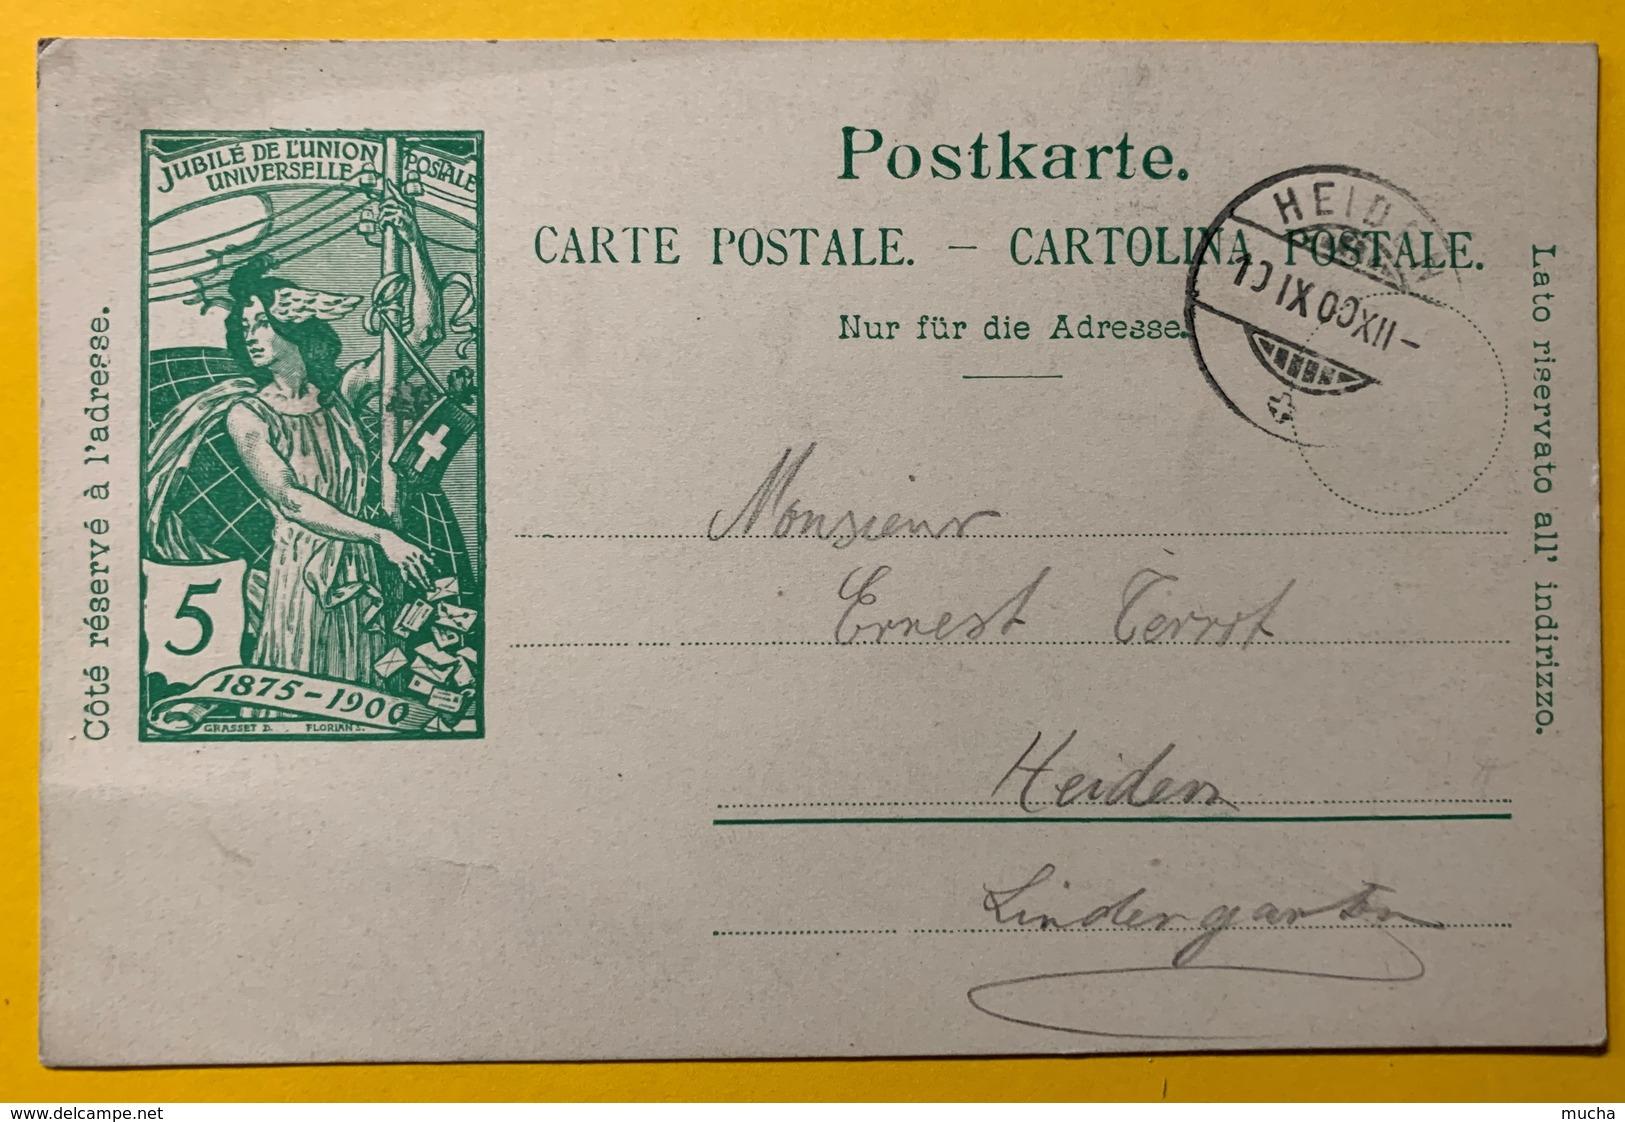 9285 - Jubilé UPU 5 Ct Vert Heiden 10.09.1900 - Entiers Postaux